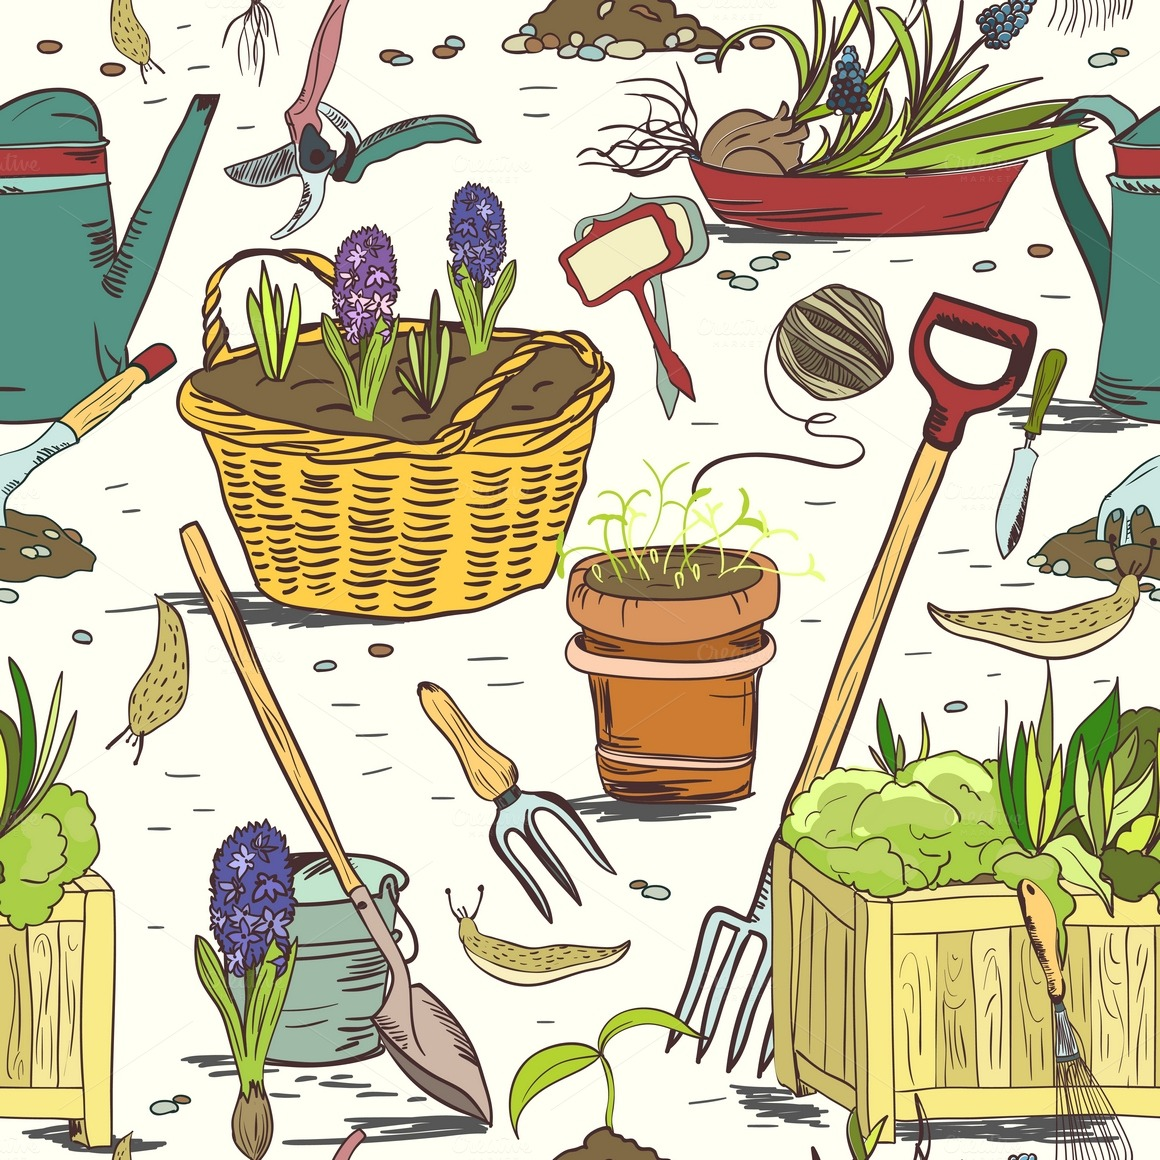 seamless garden tools patterns illustrations  creative